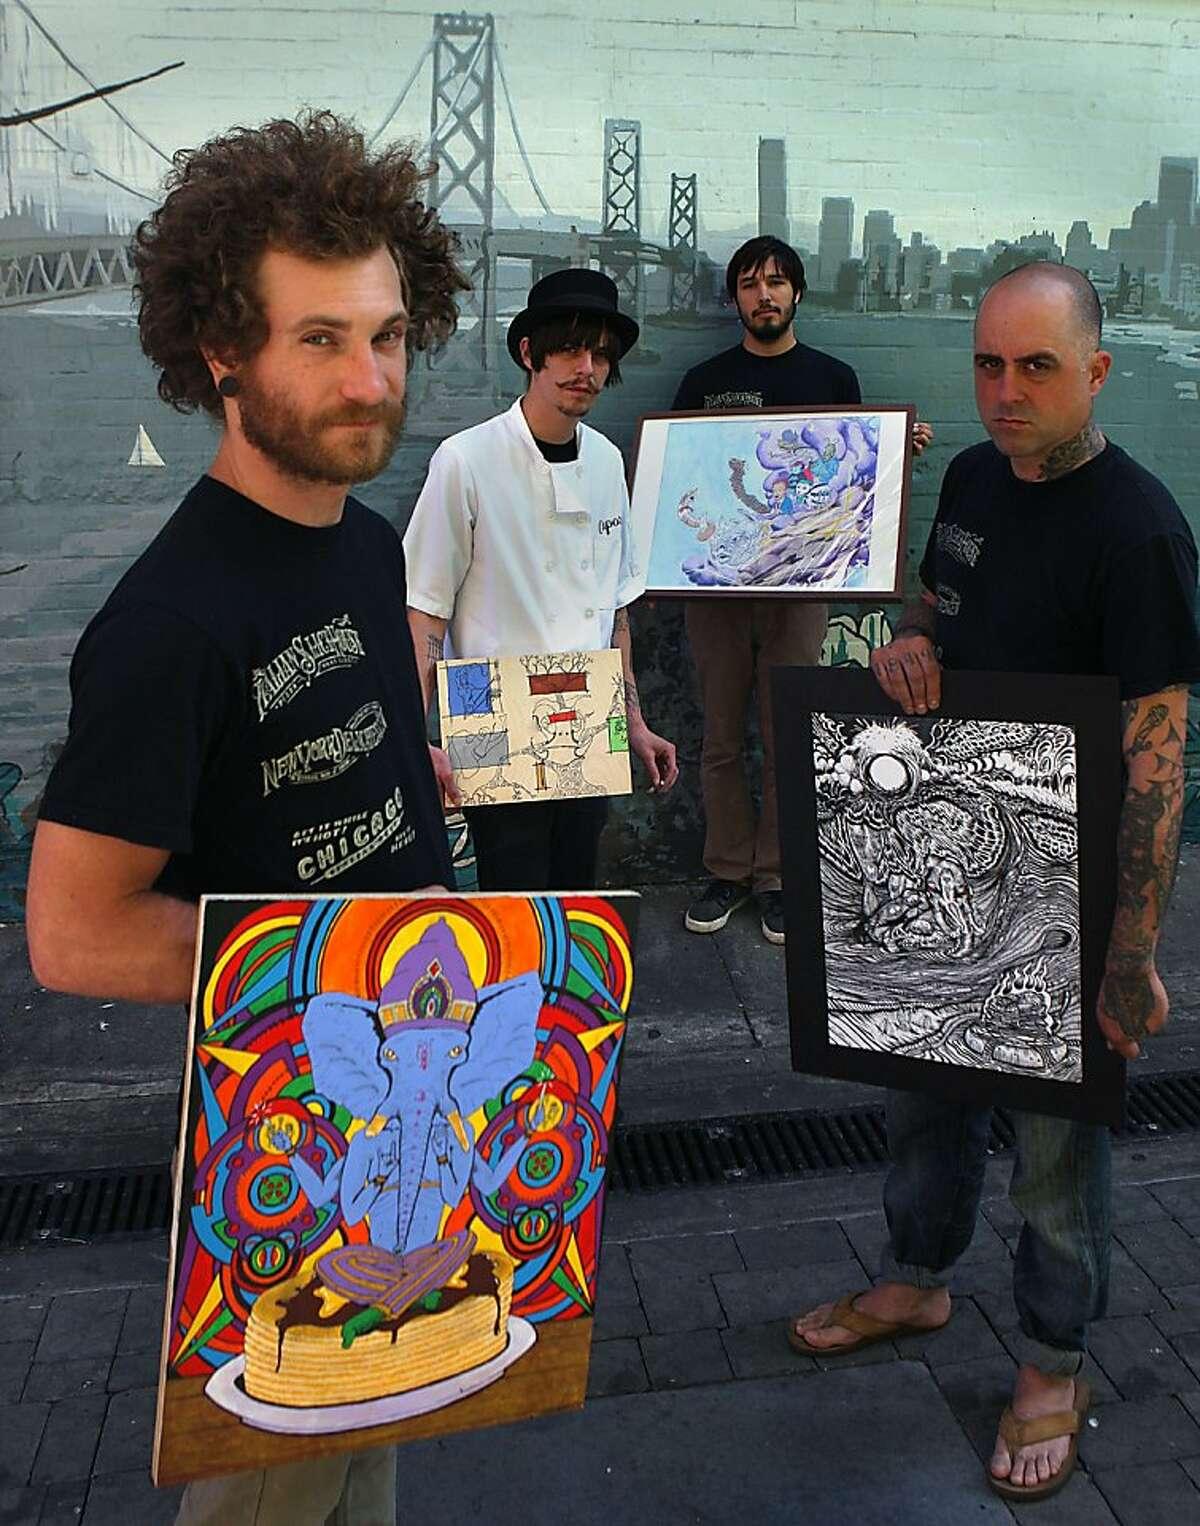 Left to right-Matt Taylor, Matt Molina, Andy Sciazko, and Ernest B. Mancuso show their artwork from